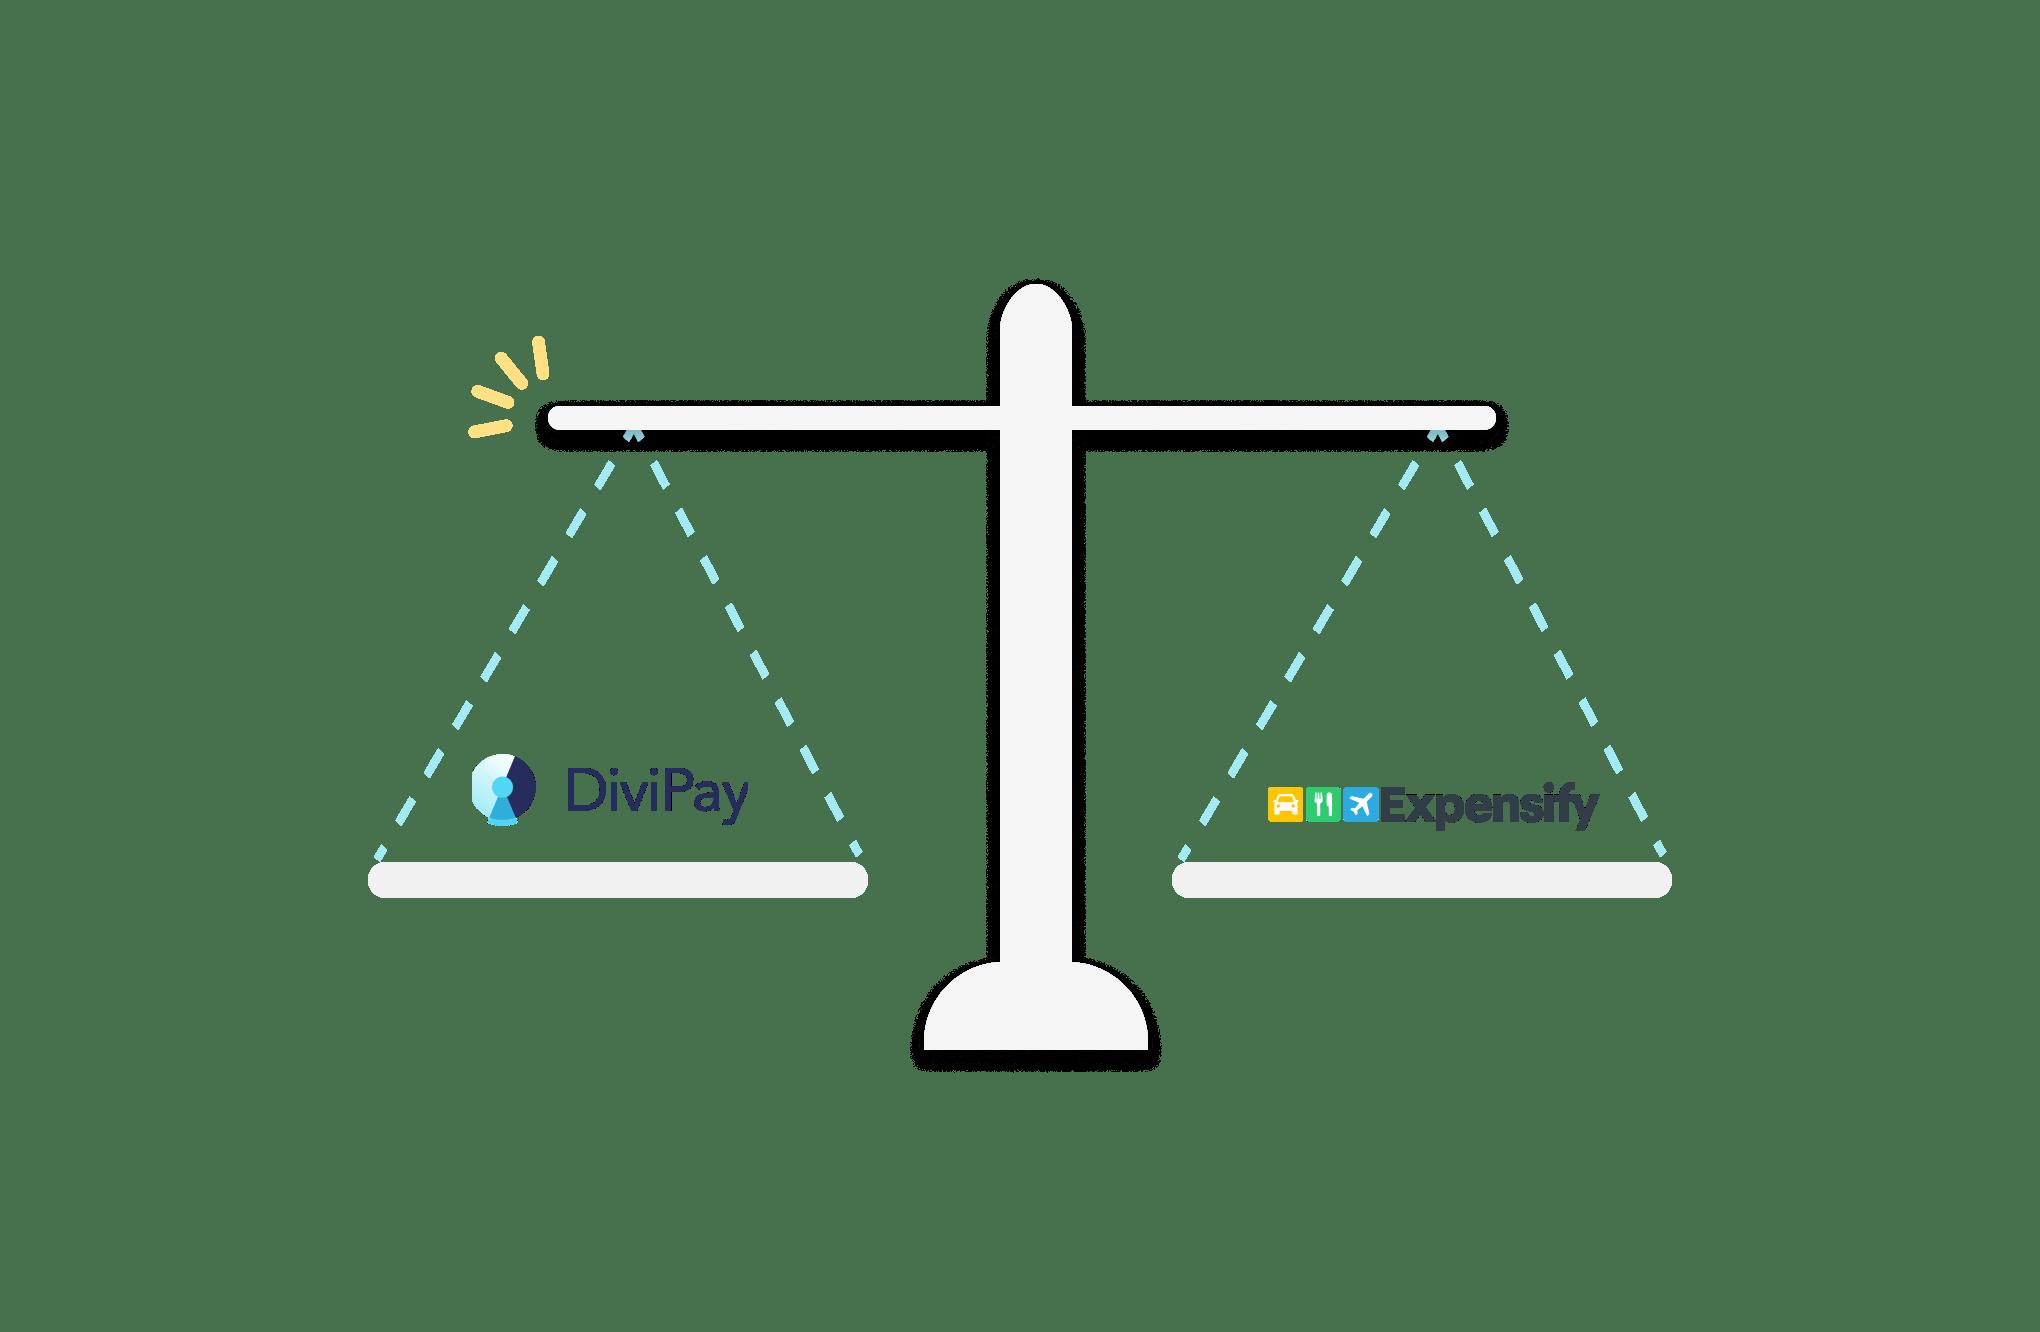 DiviPay vs Expensify